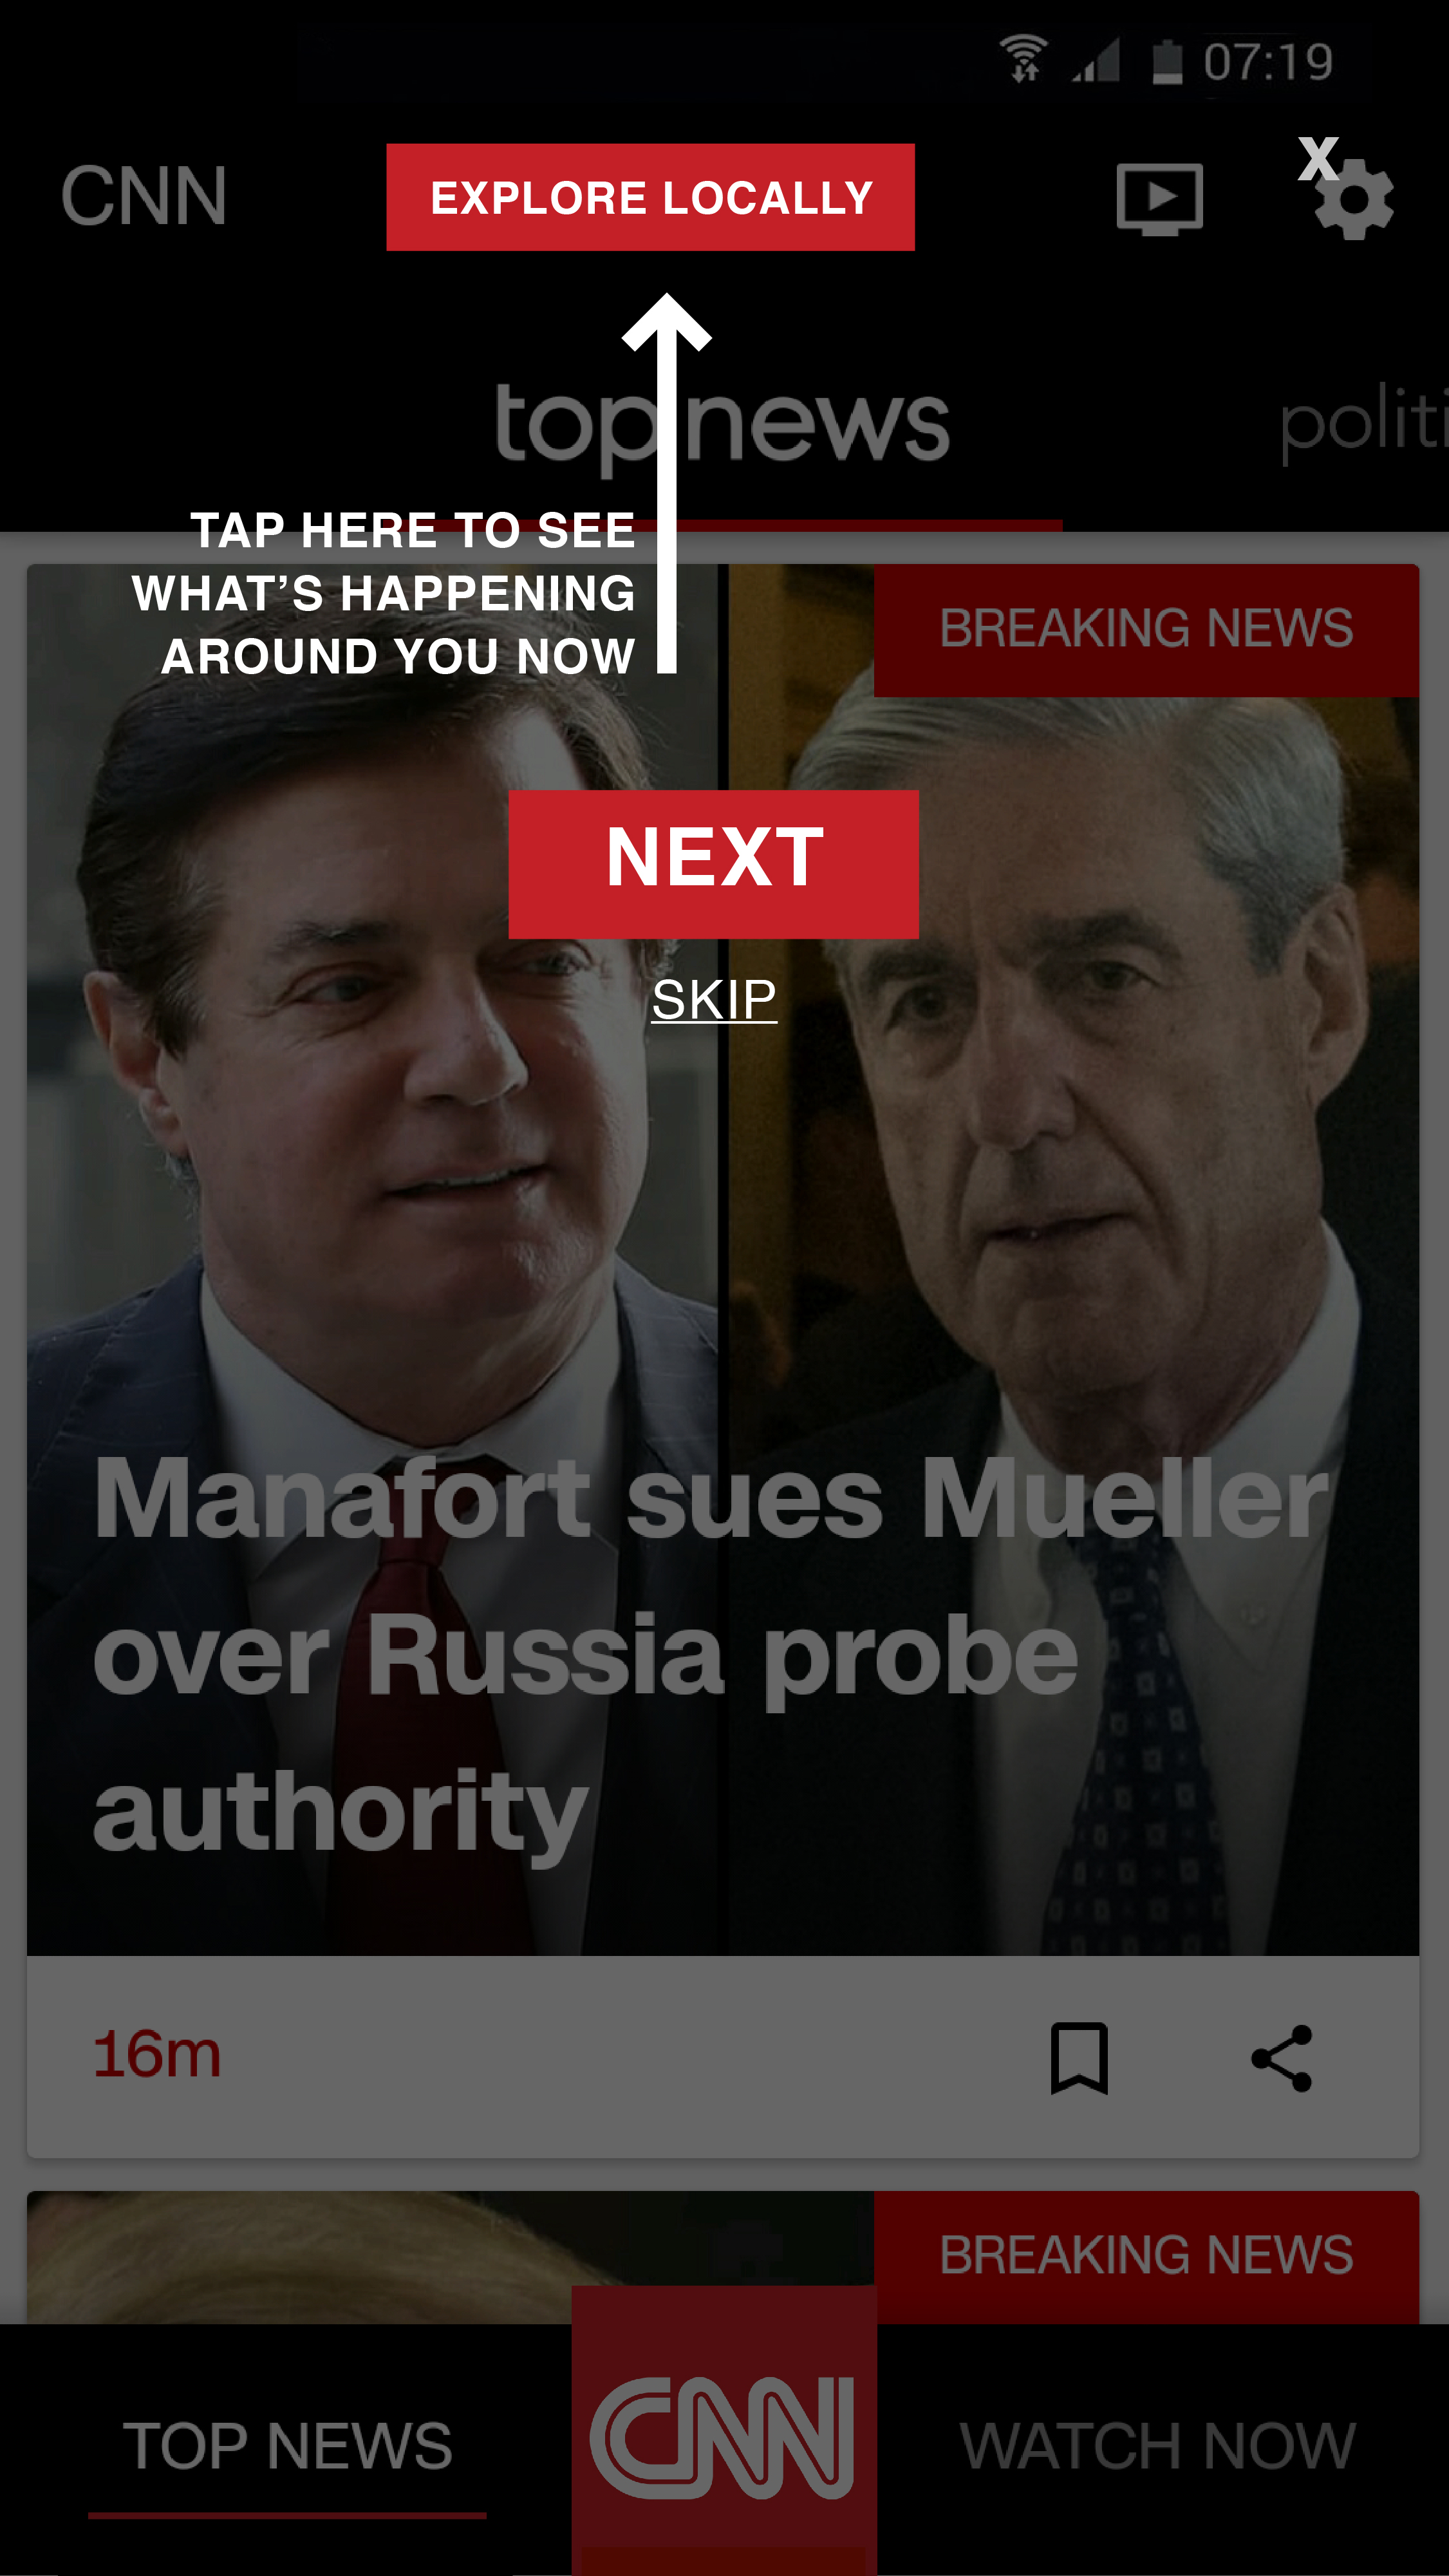 CNN App Home Page